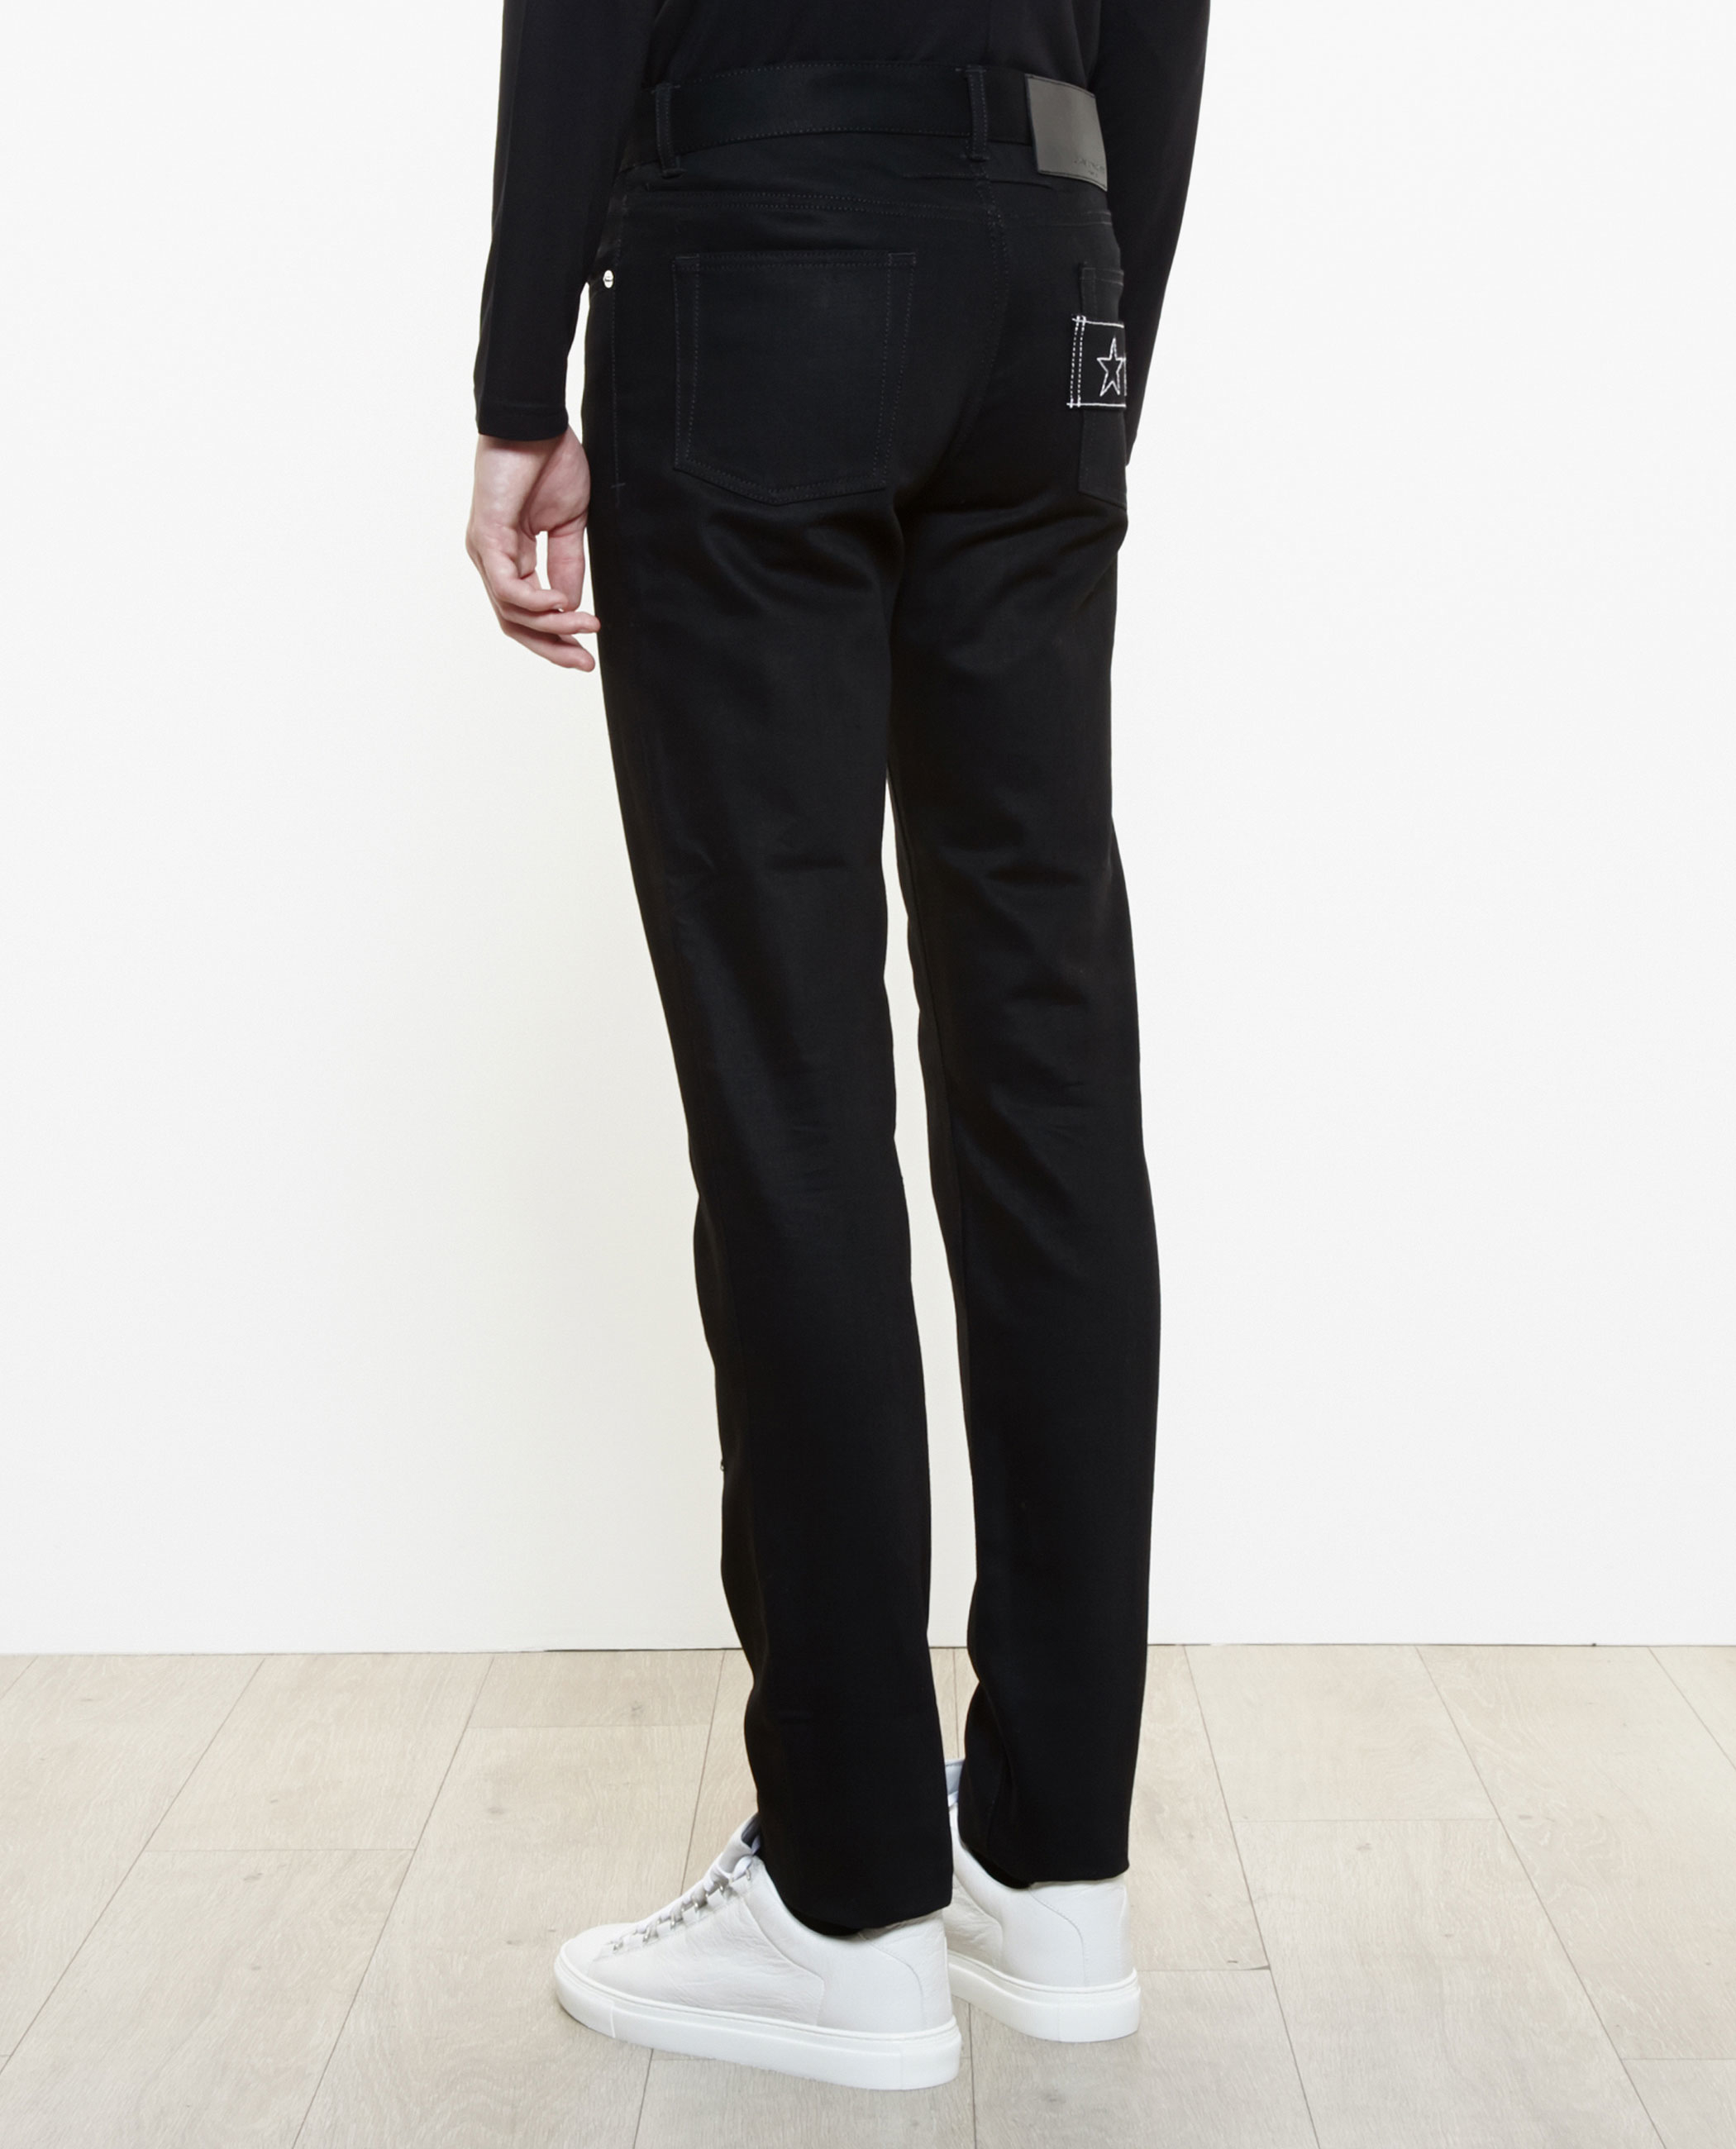 Jean Slim Embelli Givenchy ka5VBoD